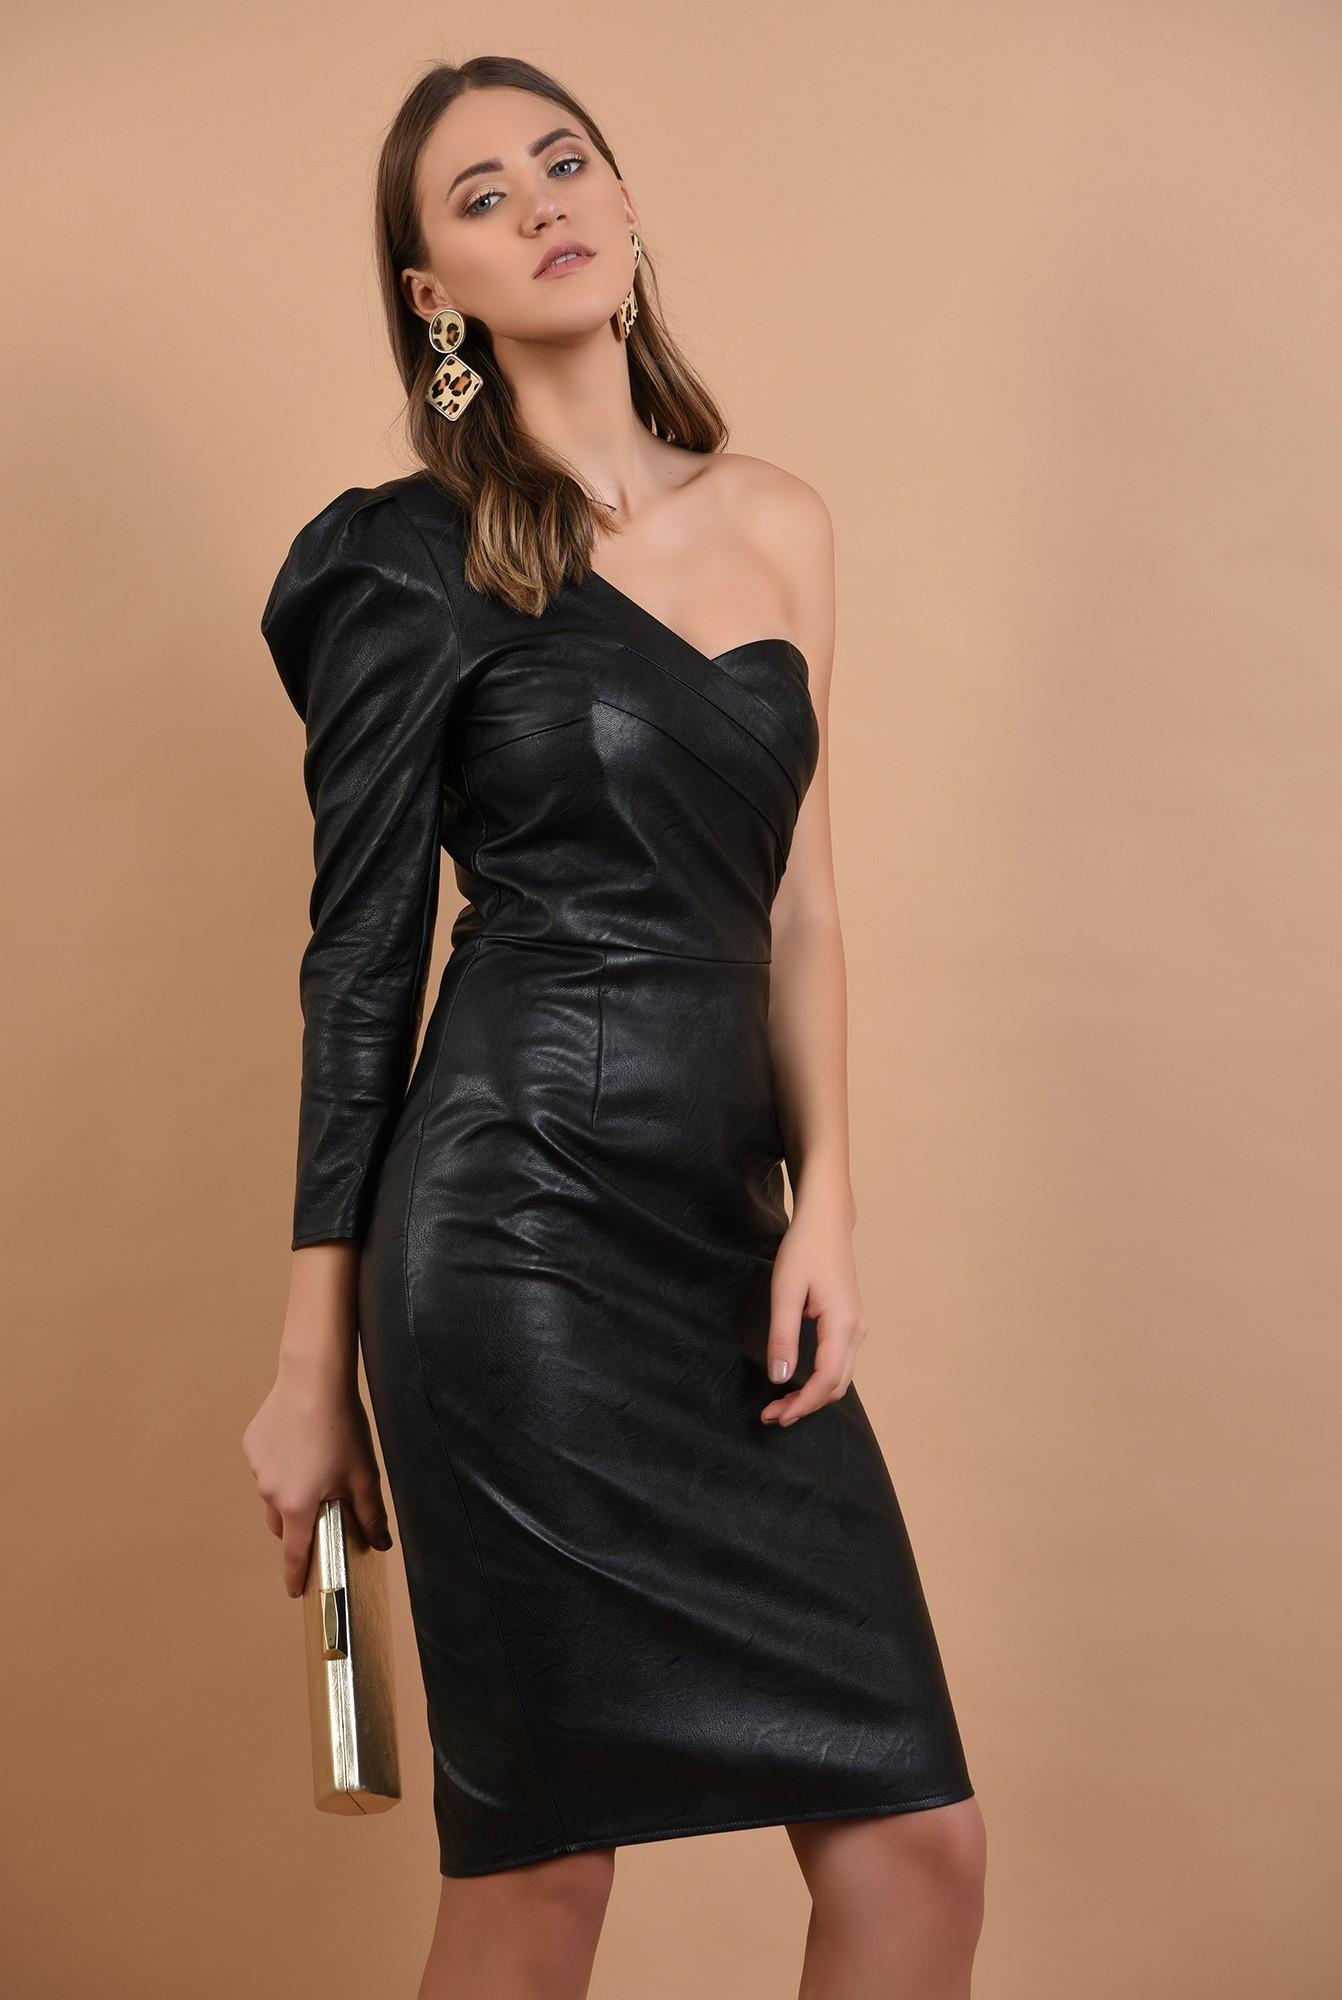 rochie eleganta, piele neagra, maneca drapata, umar gol